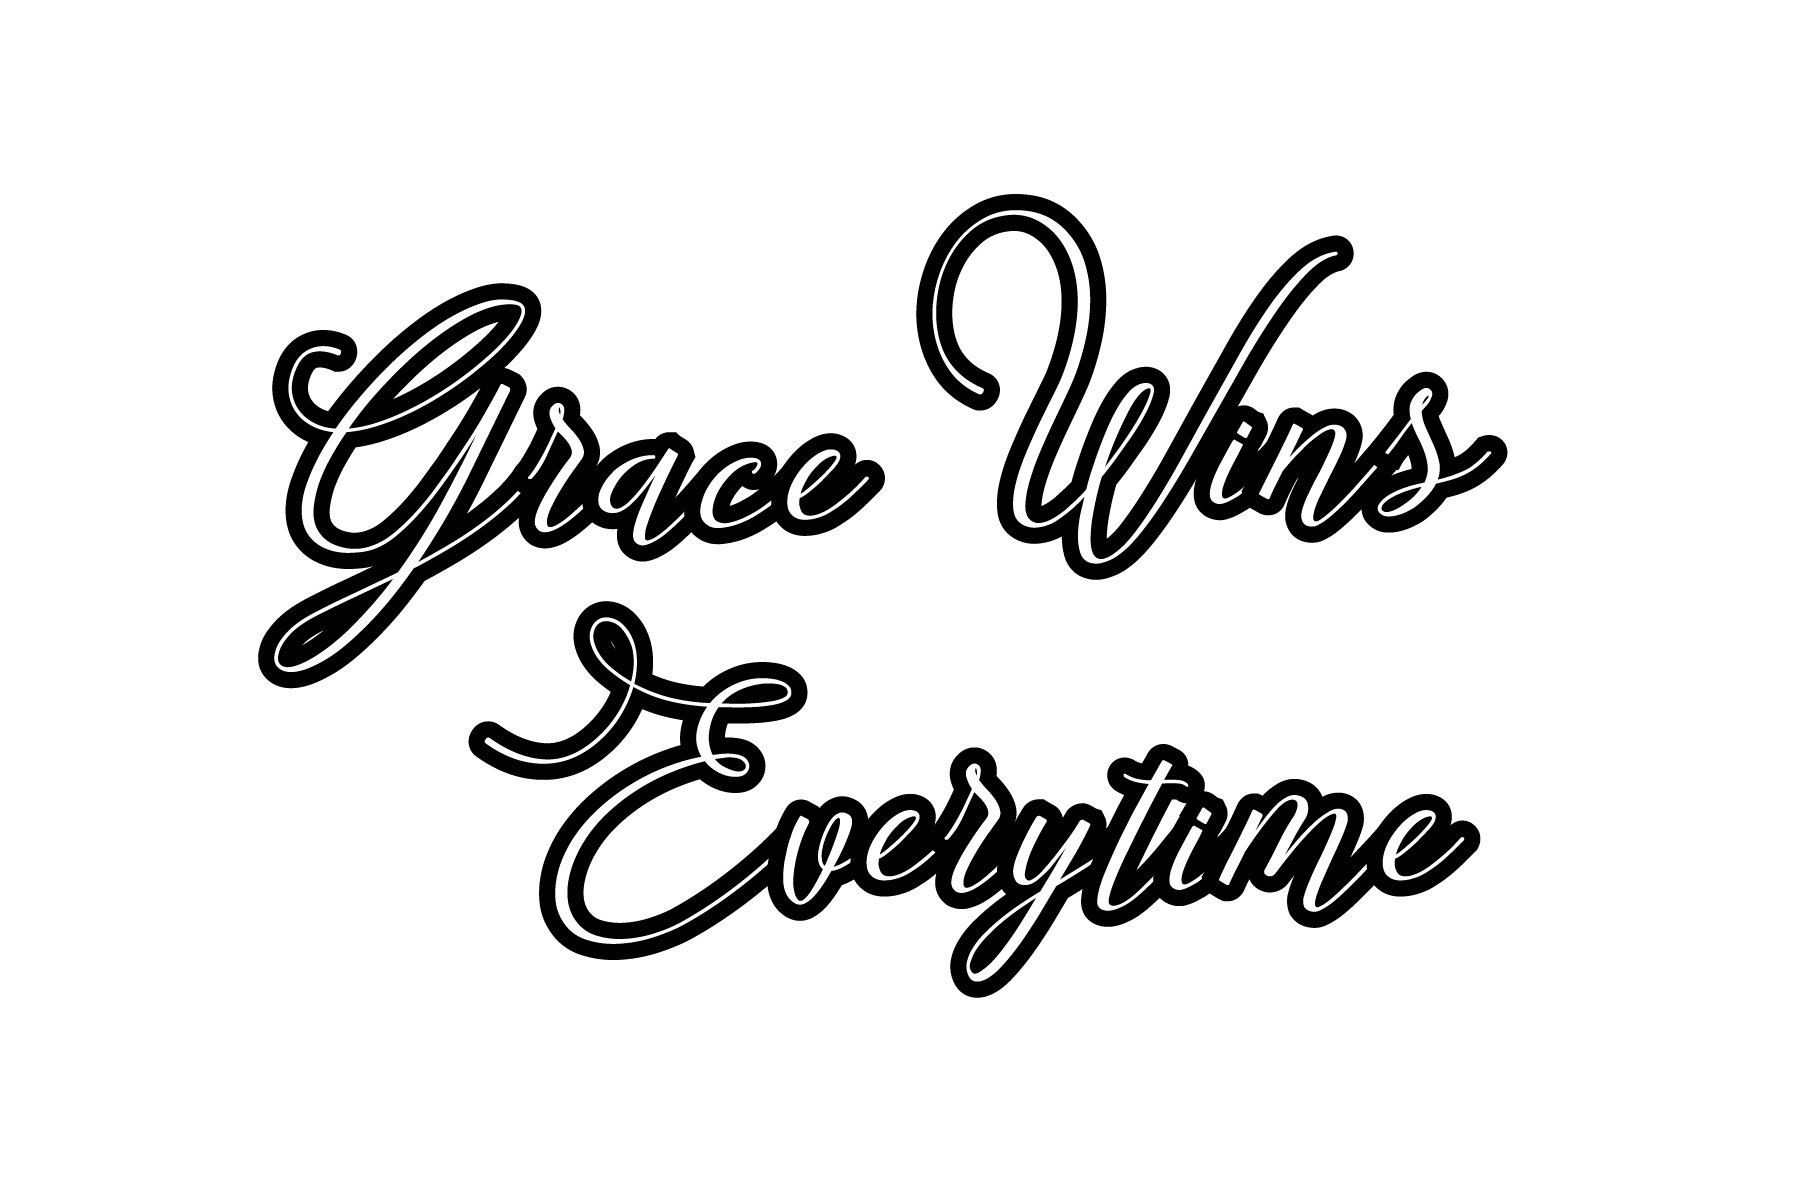 Christmas Sayings, Quotes, SVG Cut FIle, Mug, Tshirt Designs example image 6